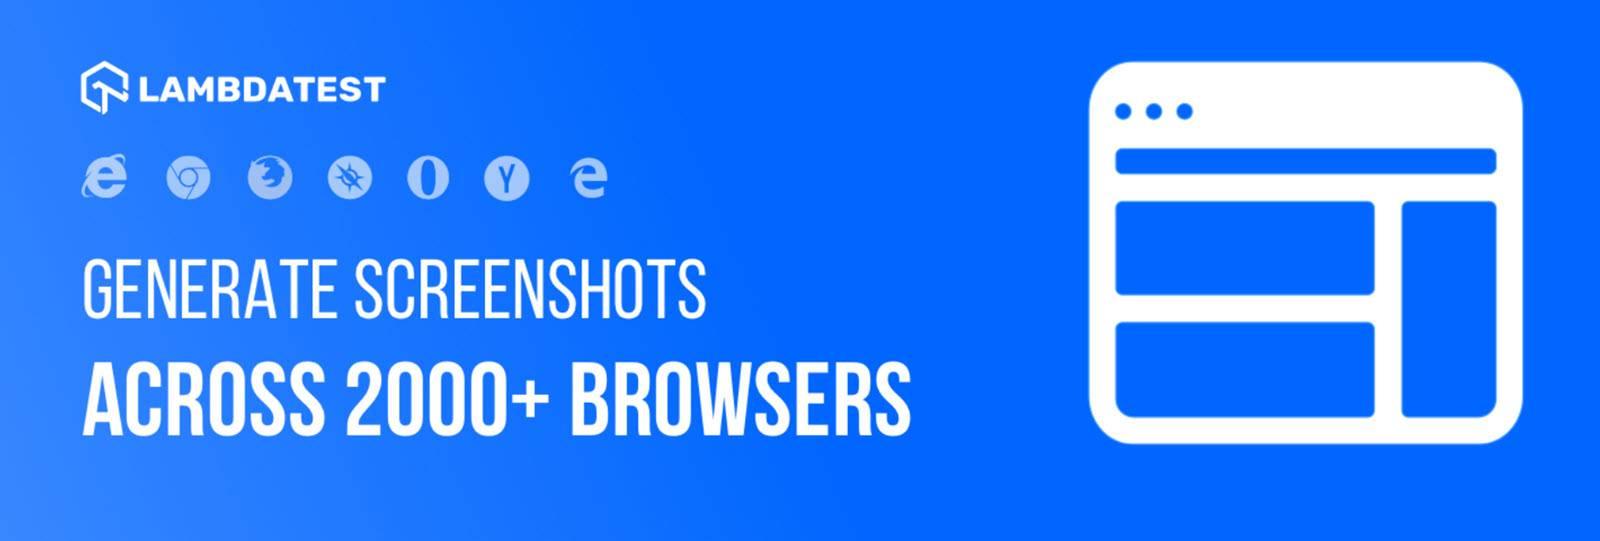 Best WordPress Plugins for Developers - Lambatest